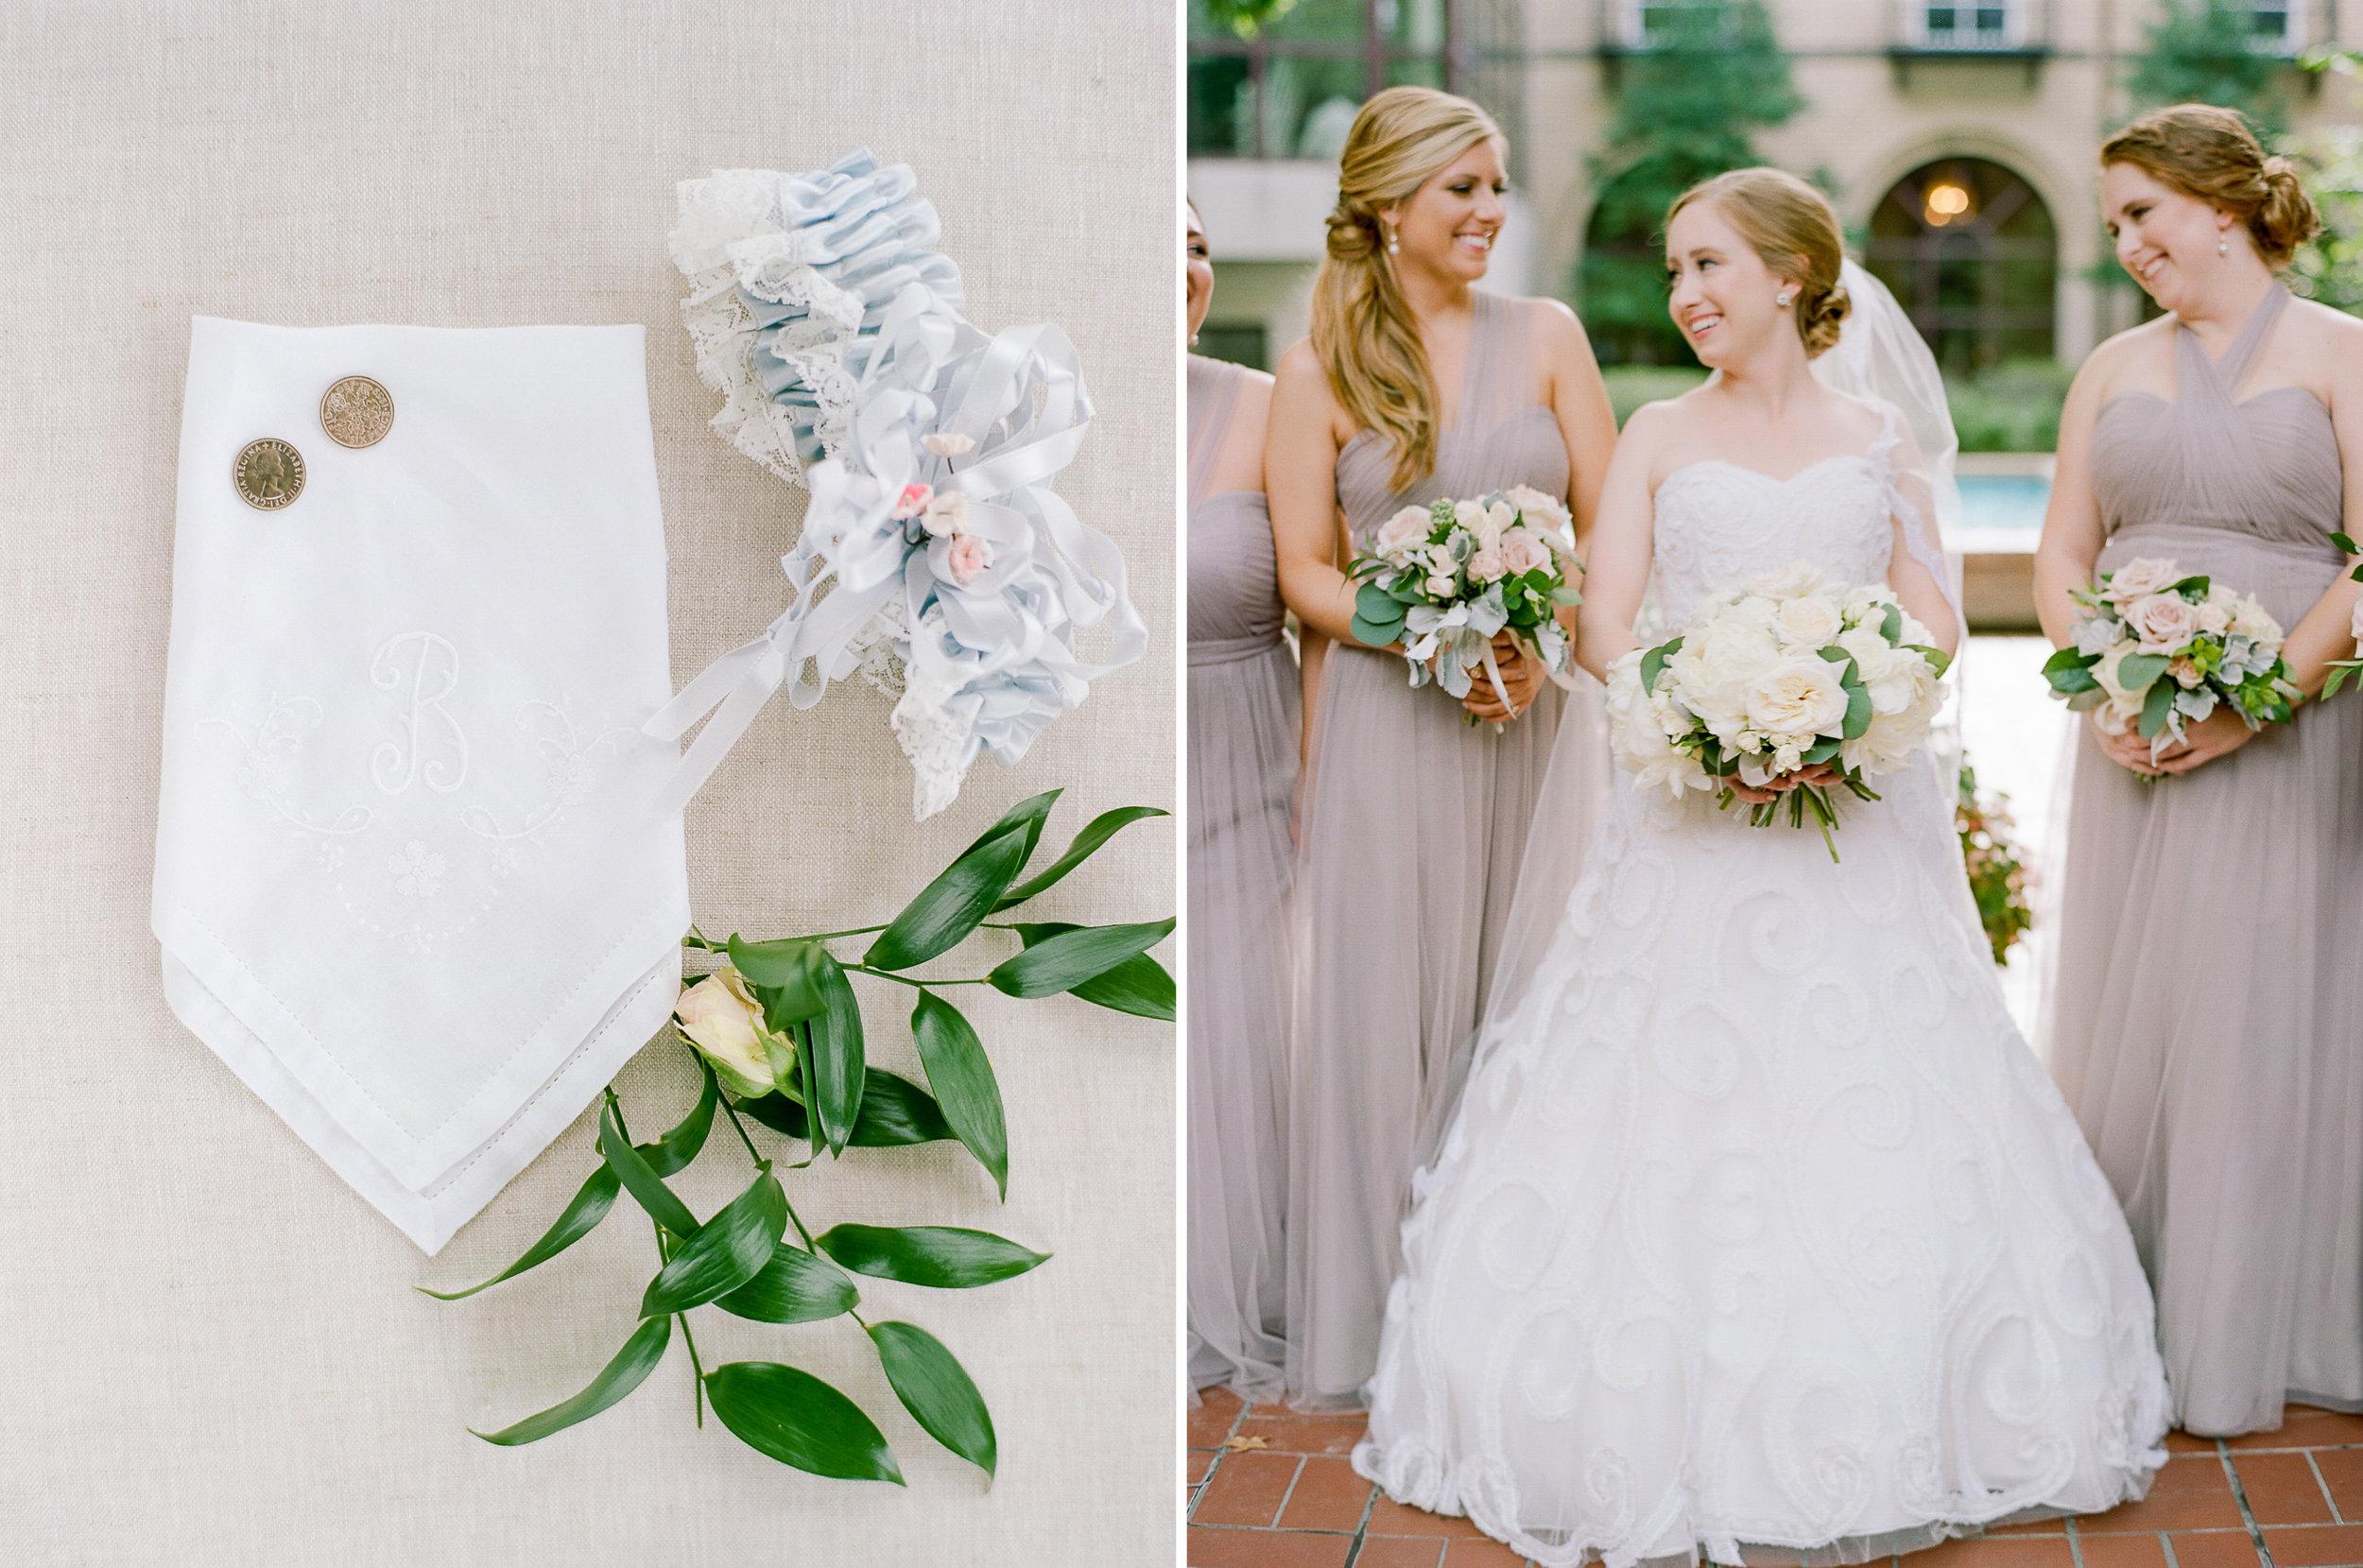 Fine-Art-Film-Houston-Wedding-Photographer-Best-Top-Luxury-Texas-Austin-Dallas-Destination-Dana-Fernandez-Photography-River-Oaks-Country-Club-South-Main-Baptist-Ceremony-Reception-Wedding-125.jpg